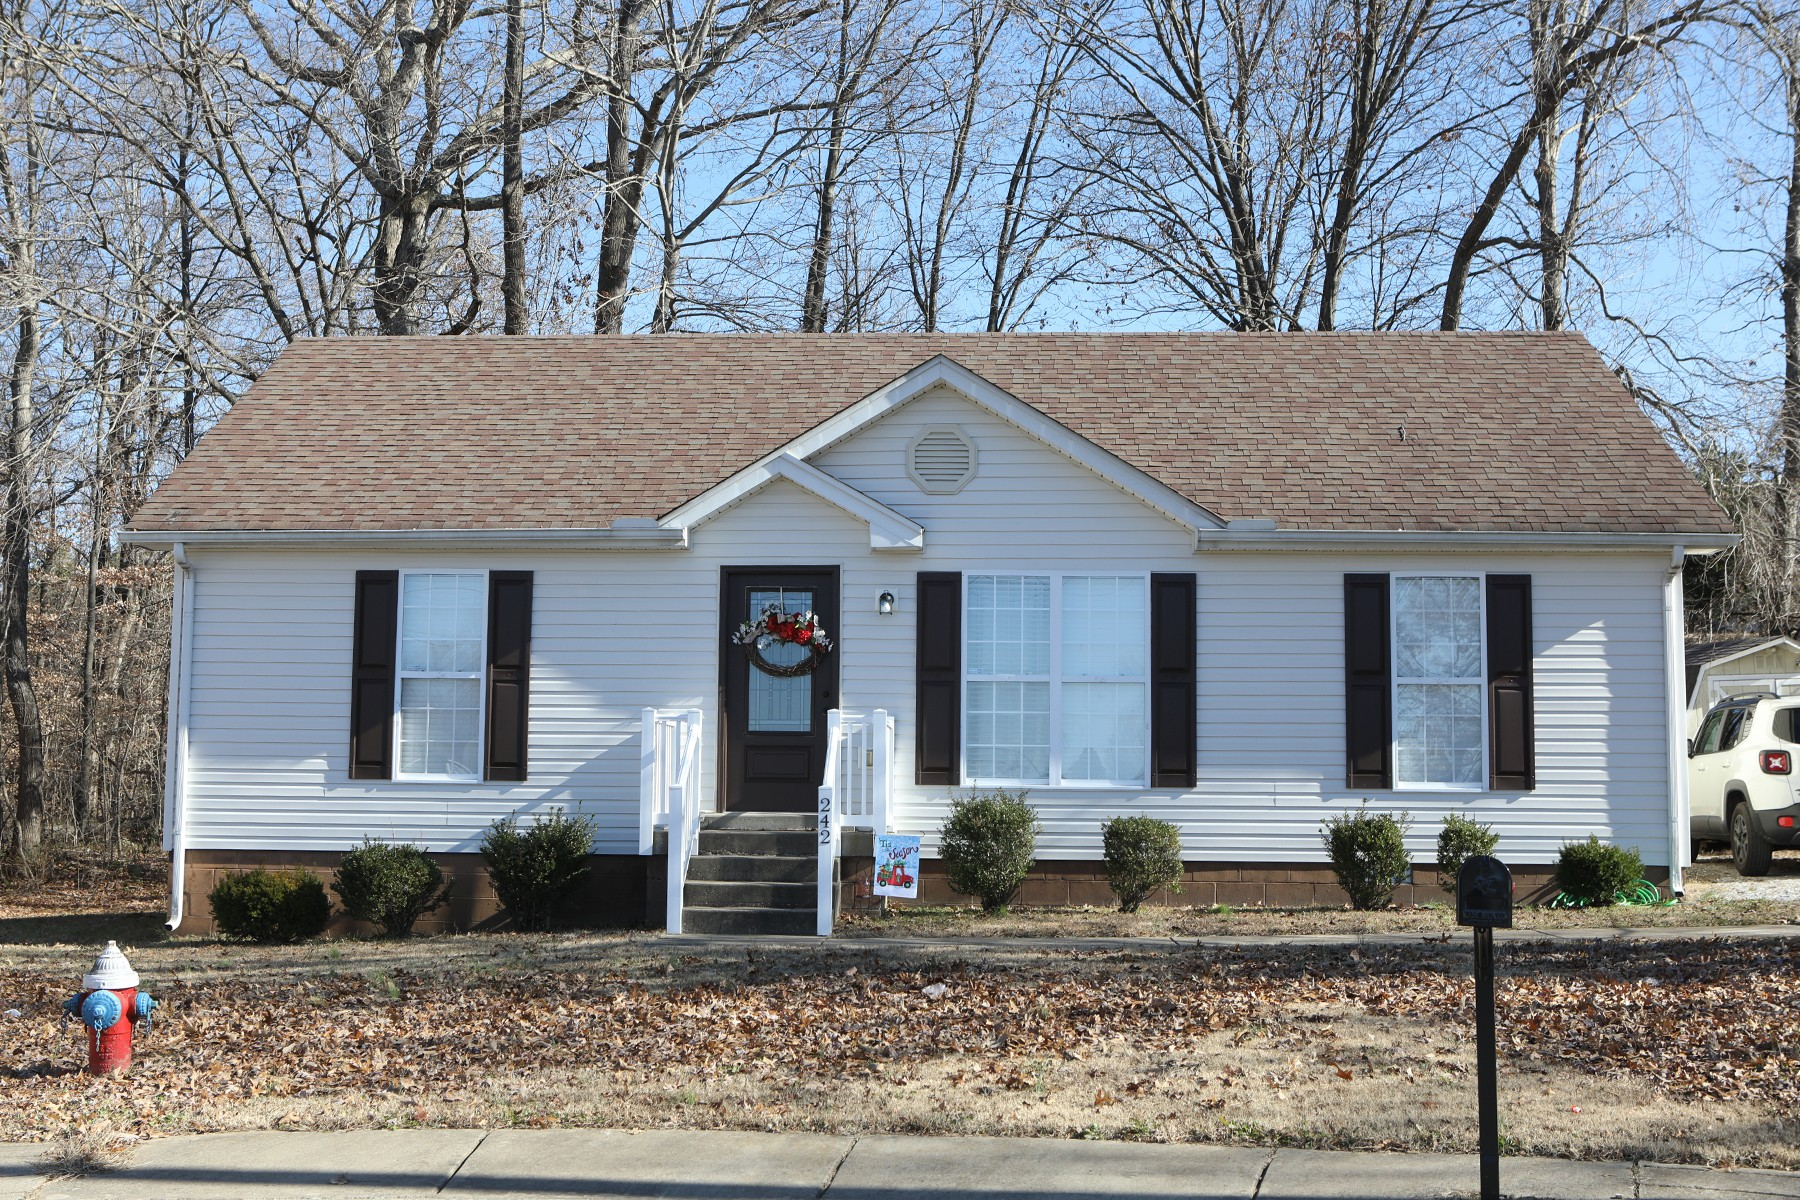 242 Sleepy Hollow Dr, Springfield, TN 37172 - Springfield, TN real estate listing